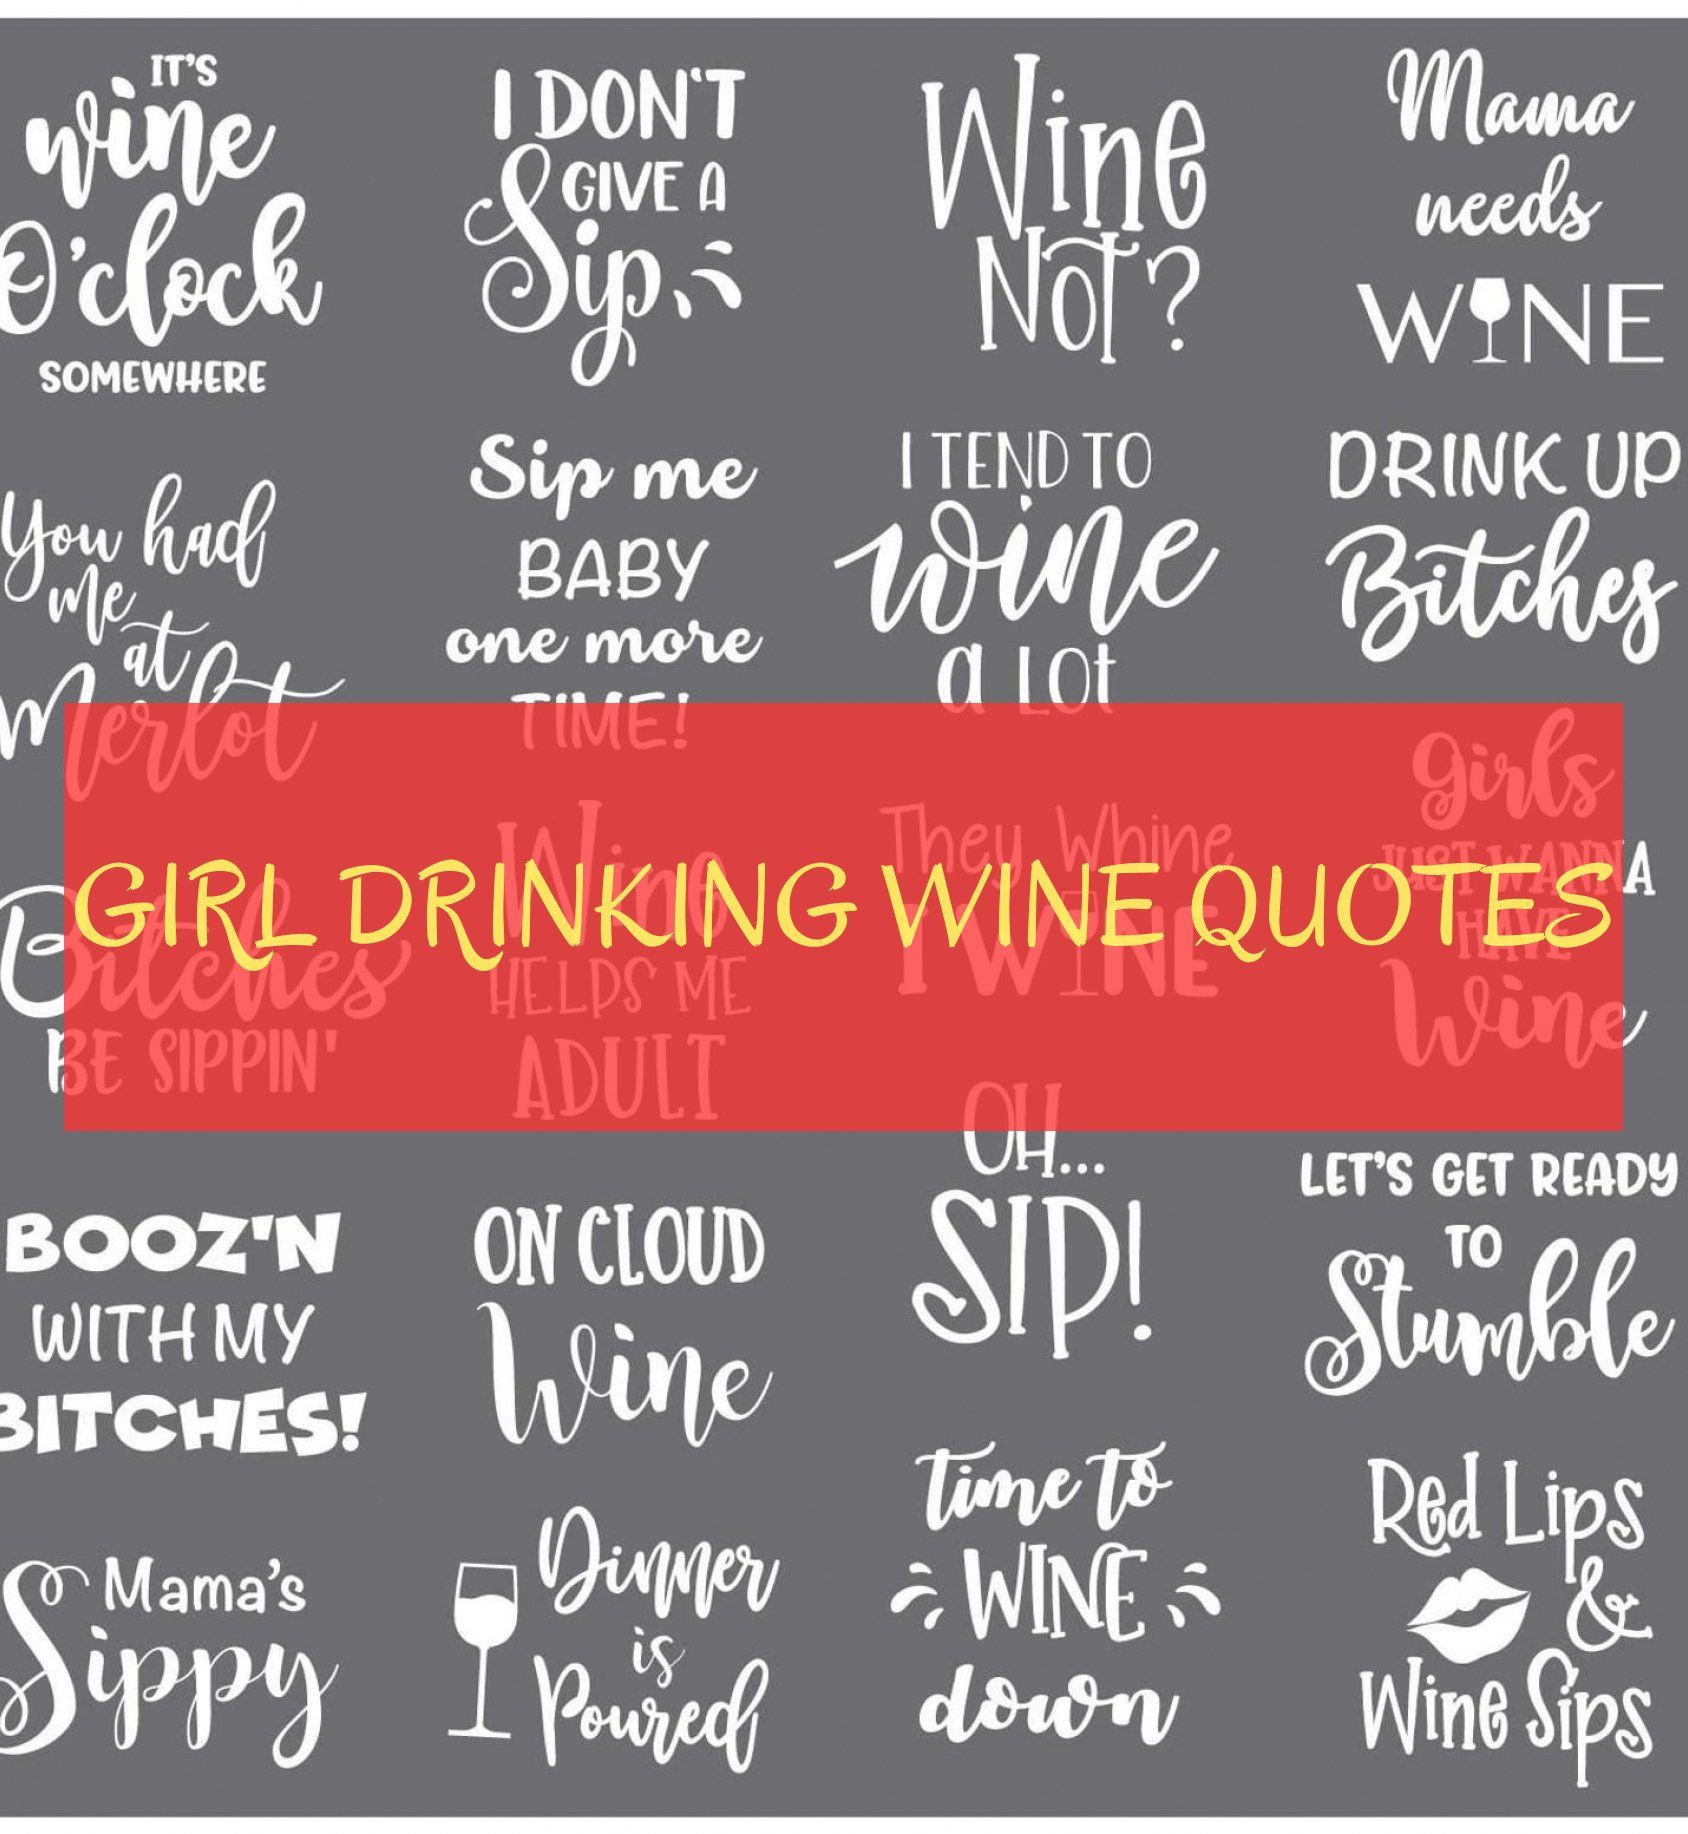 Girl Drinking Wine Quotes Madchen Wein Zitate Trinken Wine Quotes Wine Drinks Drinking Quotes